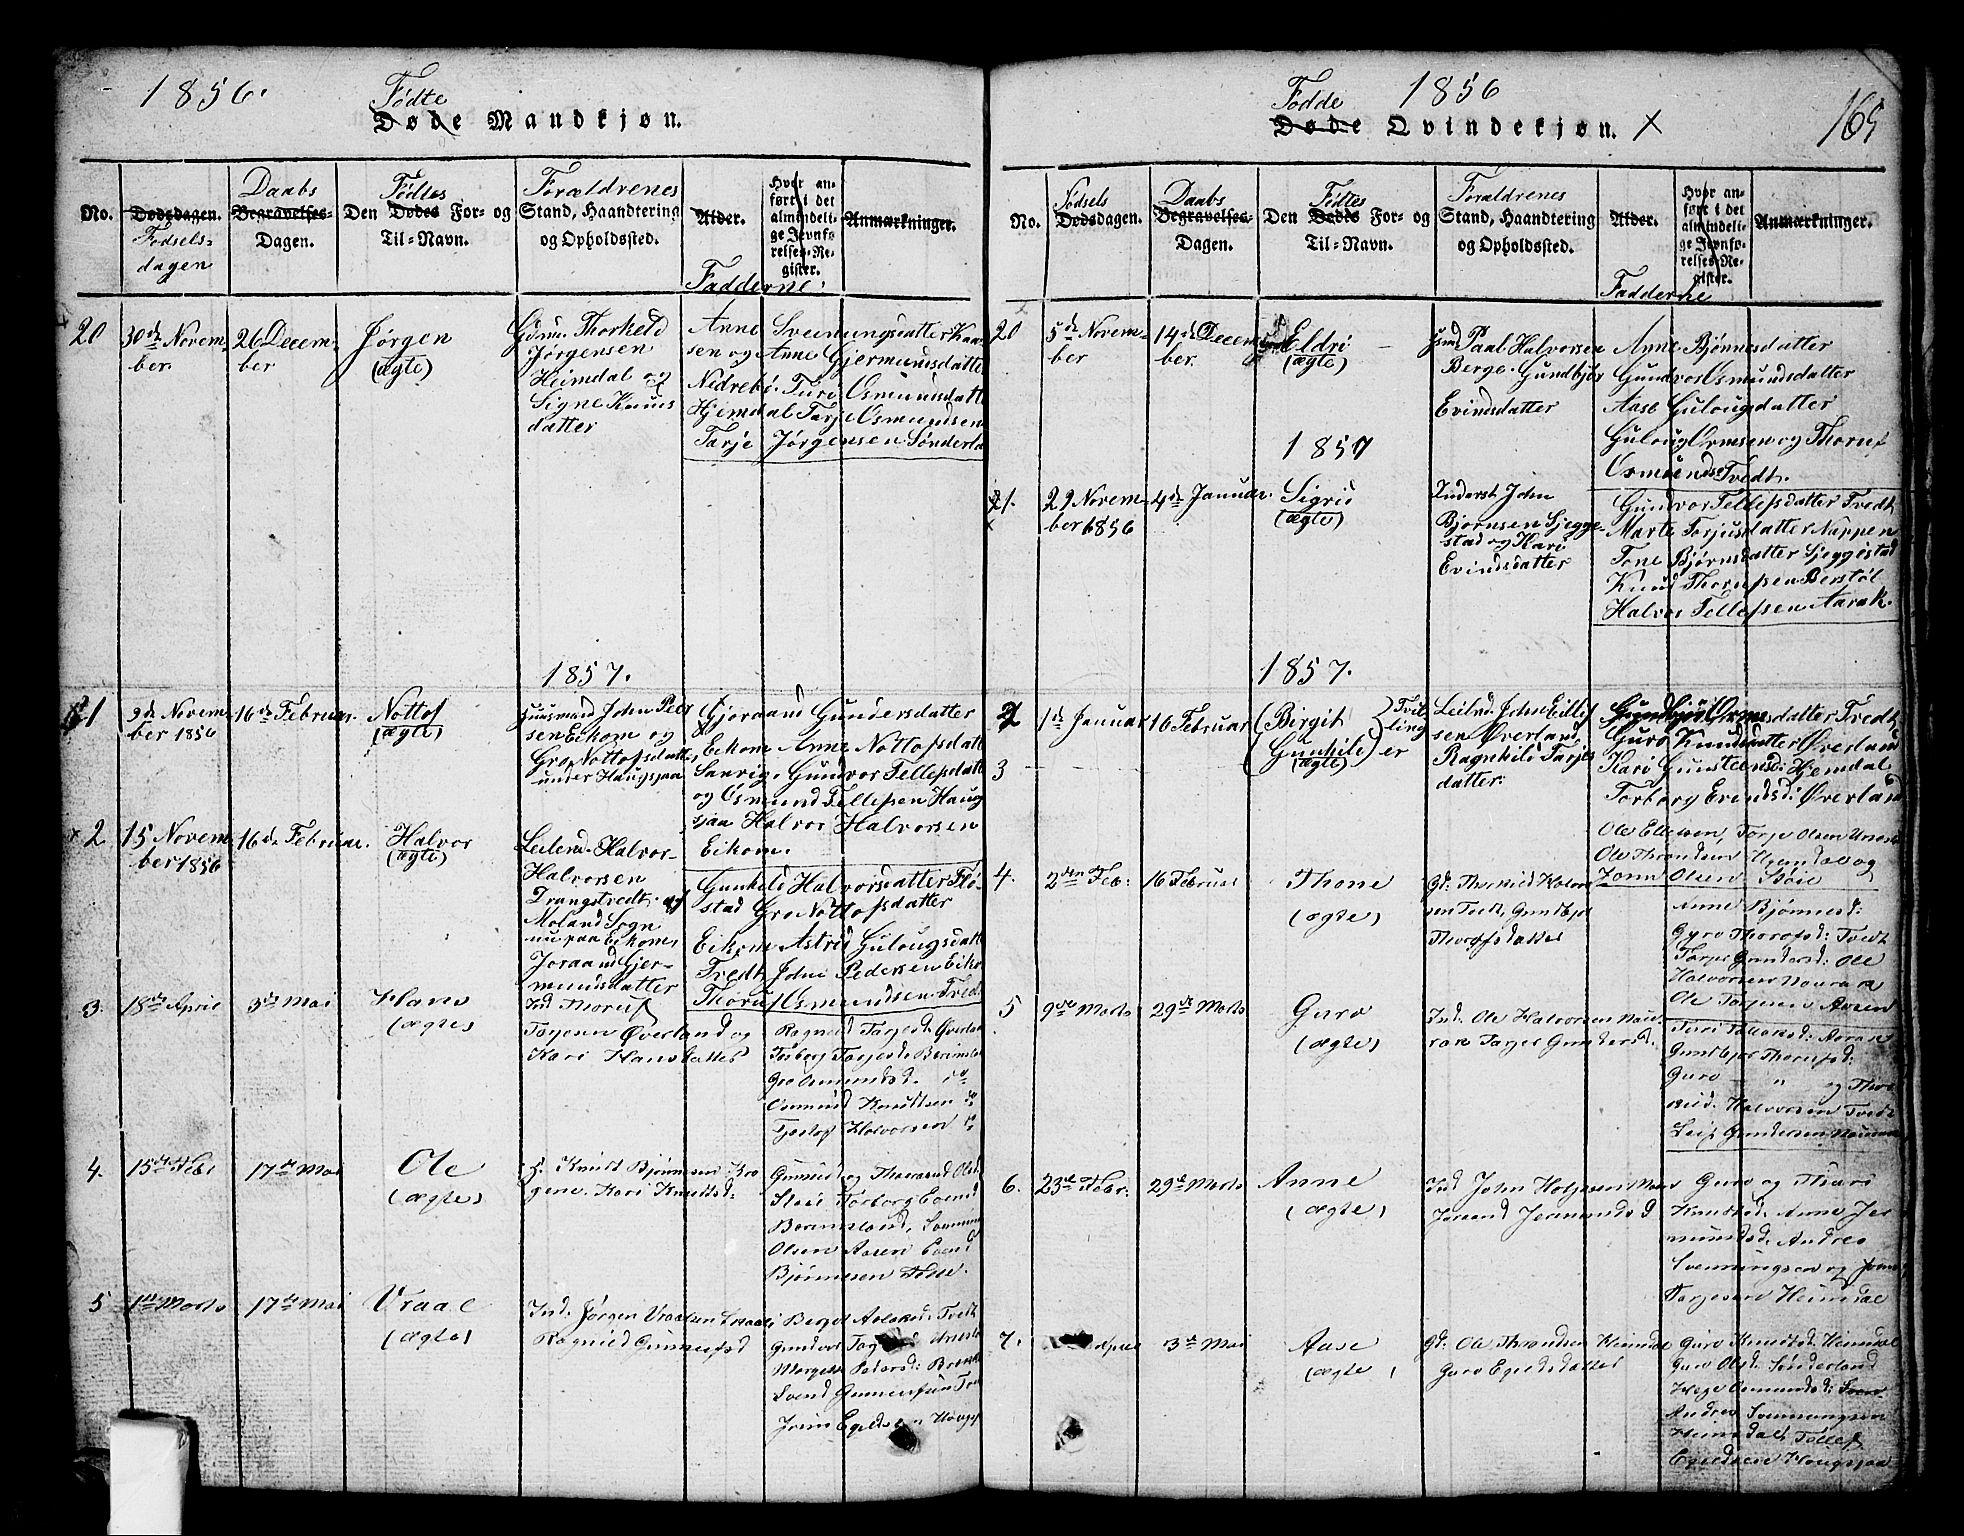 SAKO, Nissedal kirkebøker, G/Gb/L0001: Klokkerbok nr. II 1, 1814-1862, s. 165